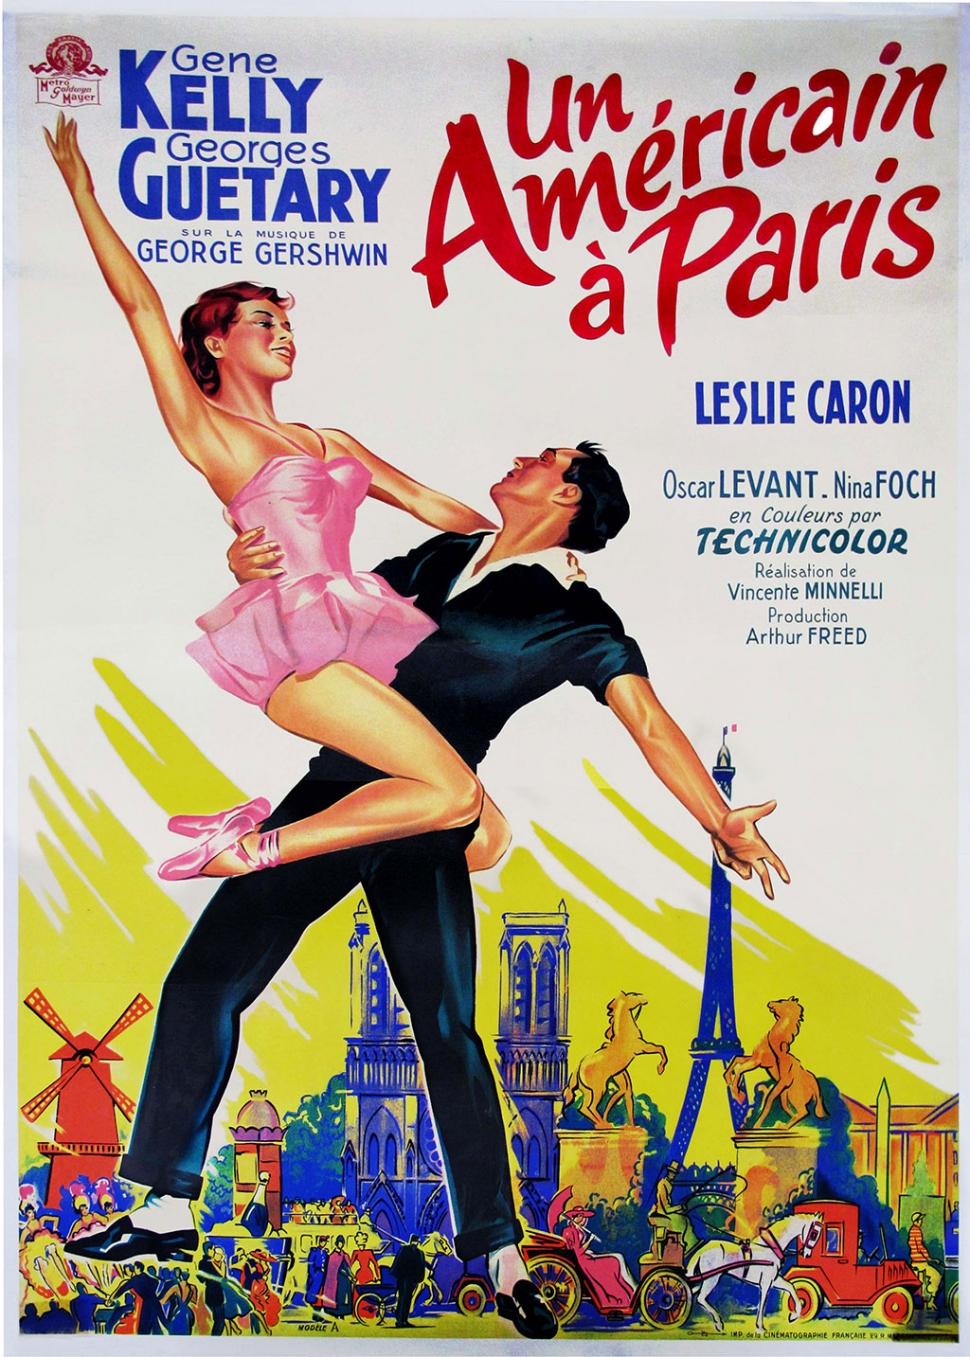 Dance-Paris-10-29-13.jpg